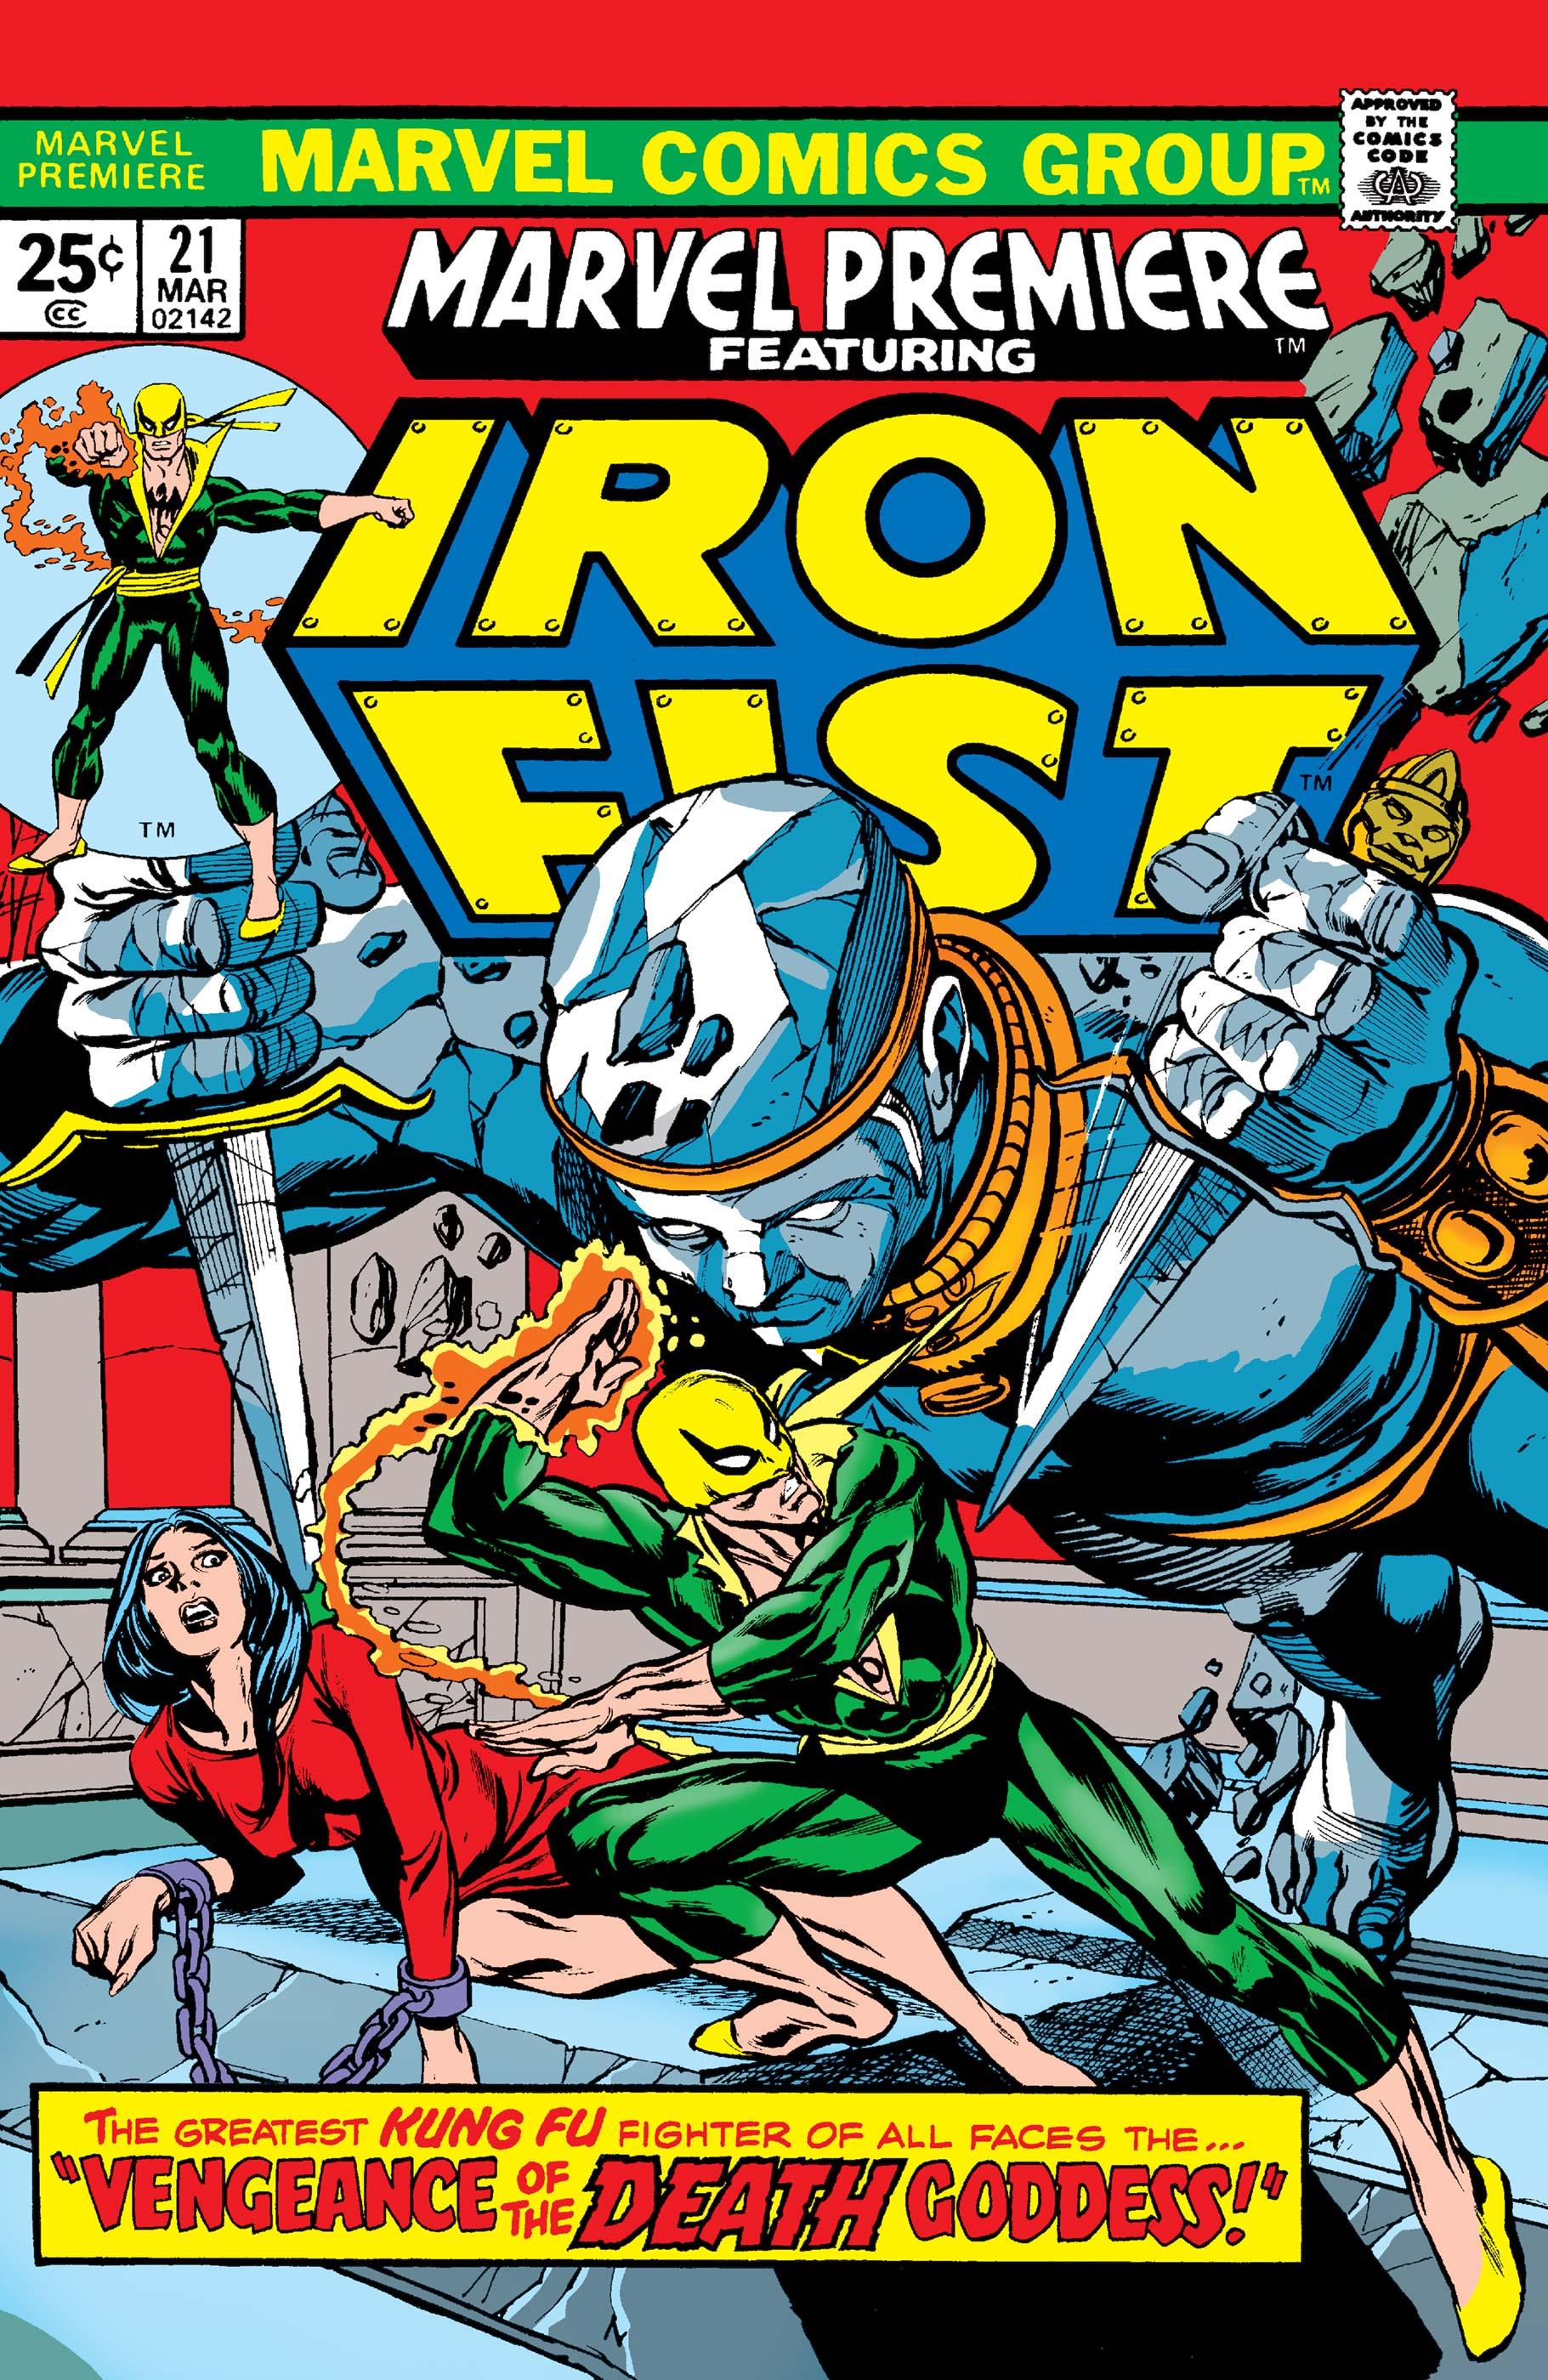 Marvel Premiere (1972) #21